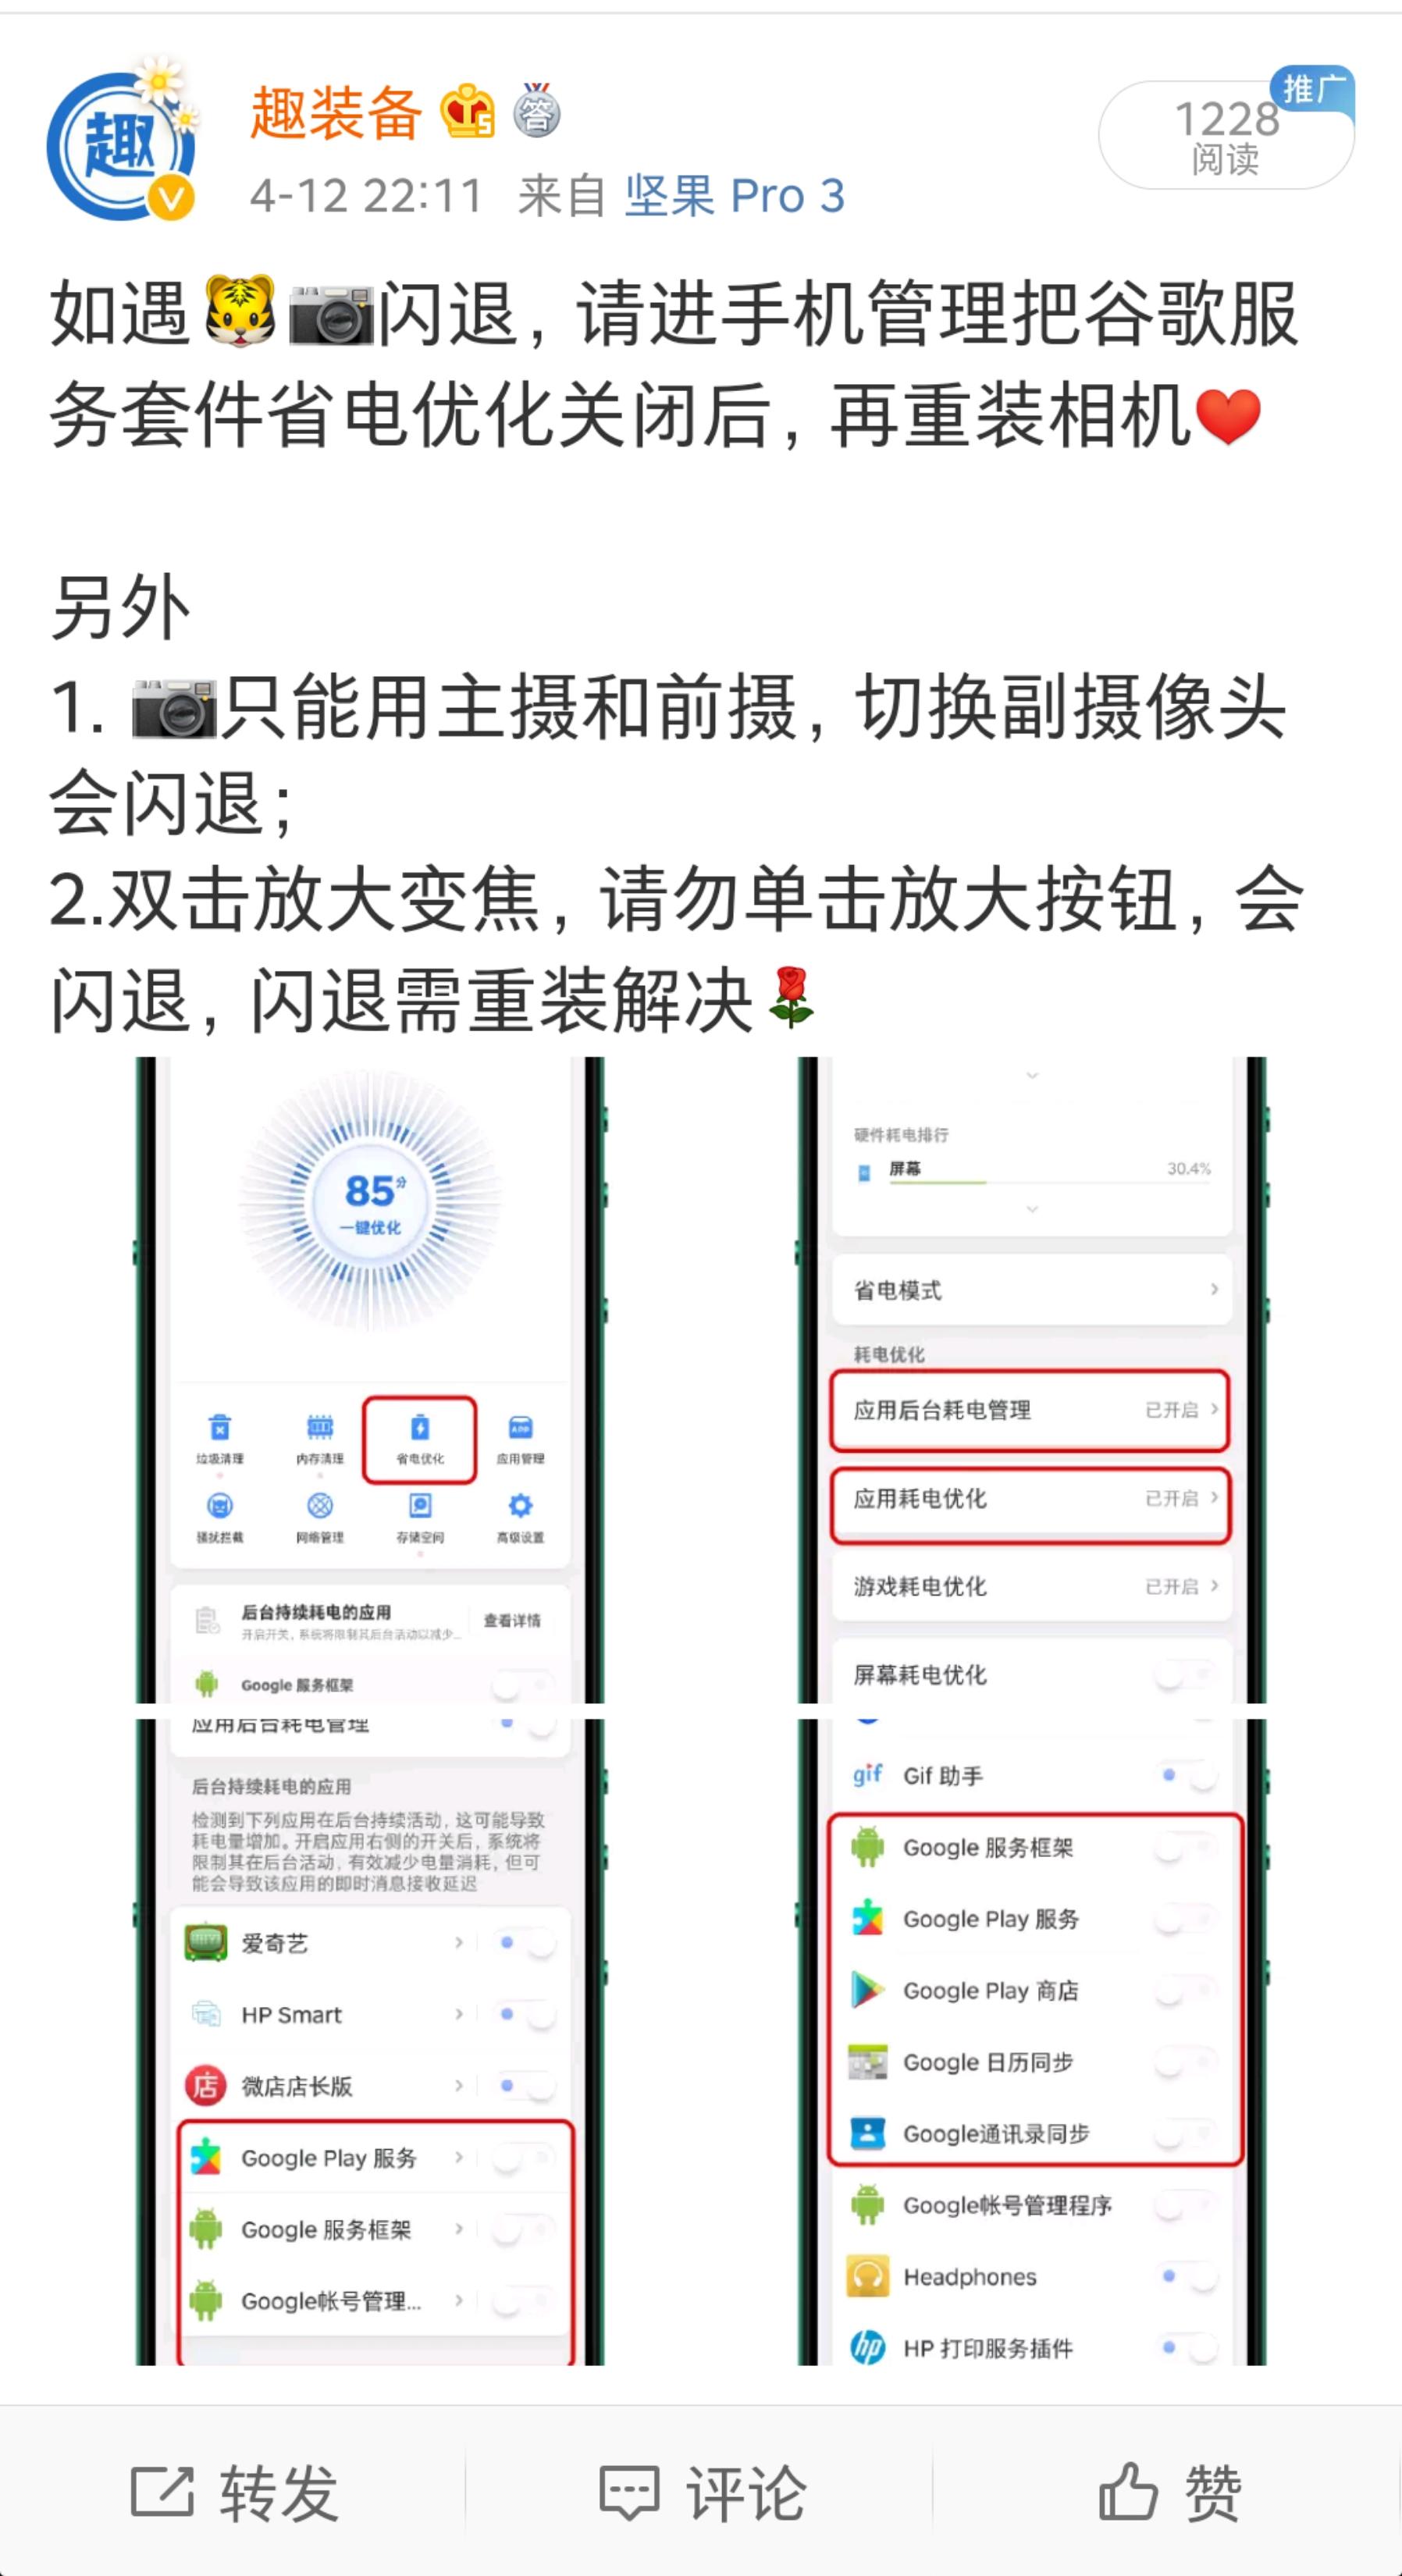 Screenshot_2020-04-12-22-37-05-587_??.png